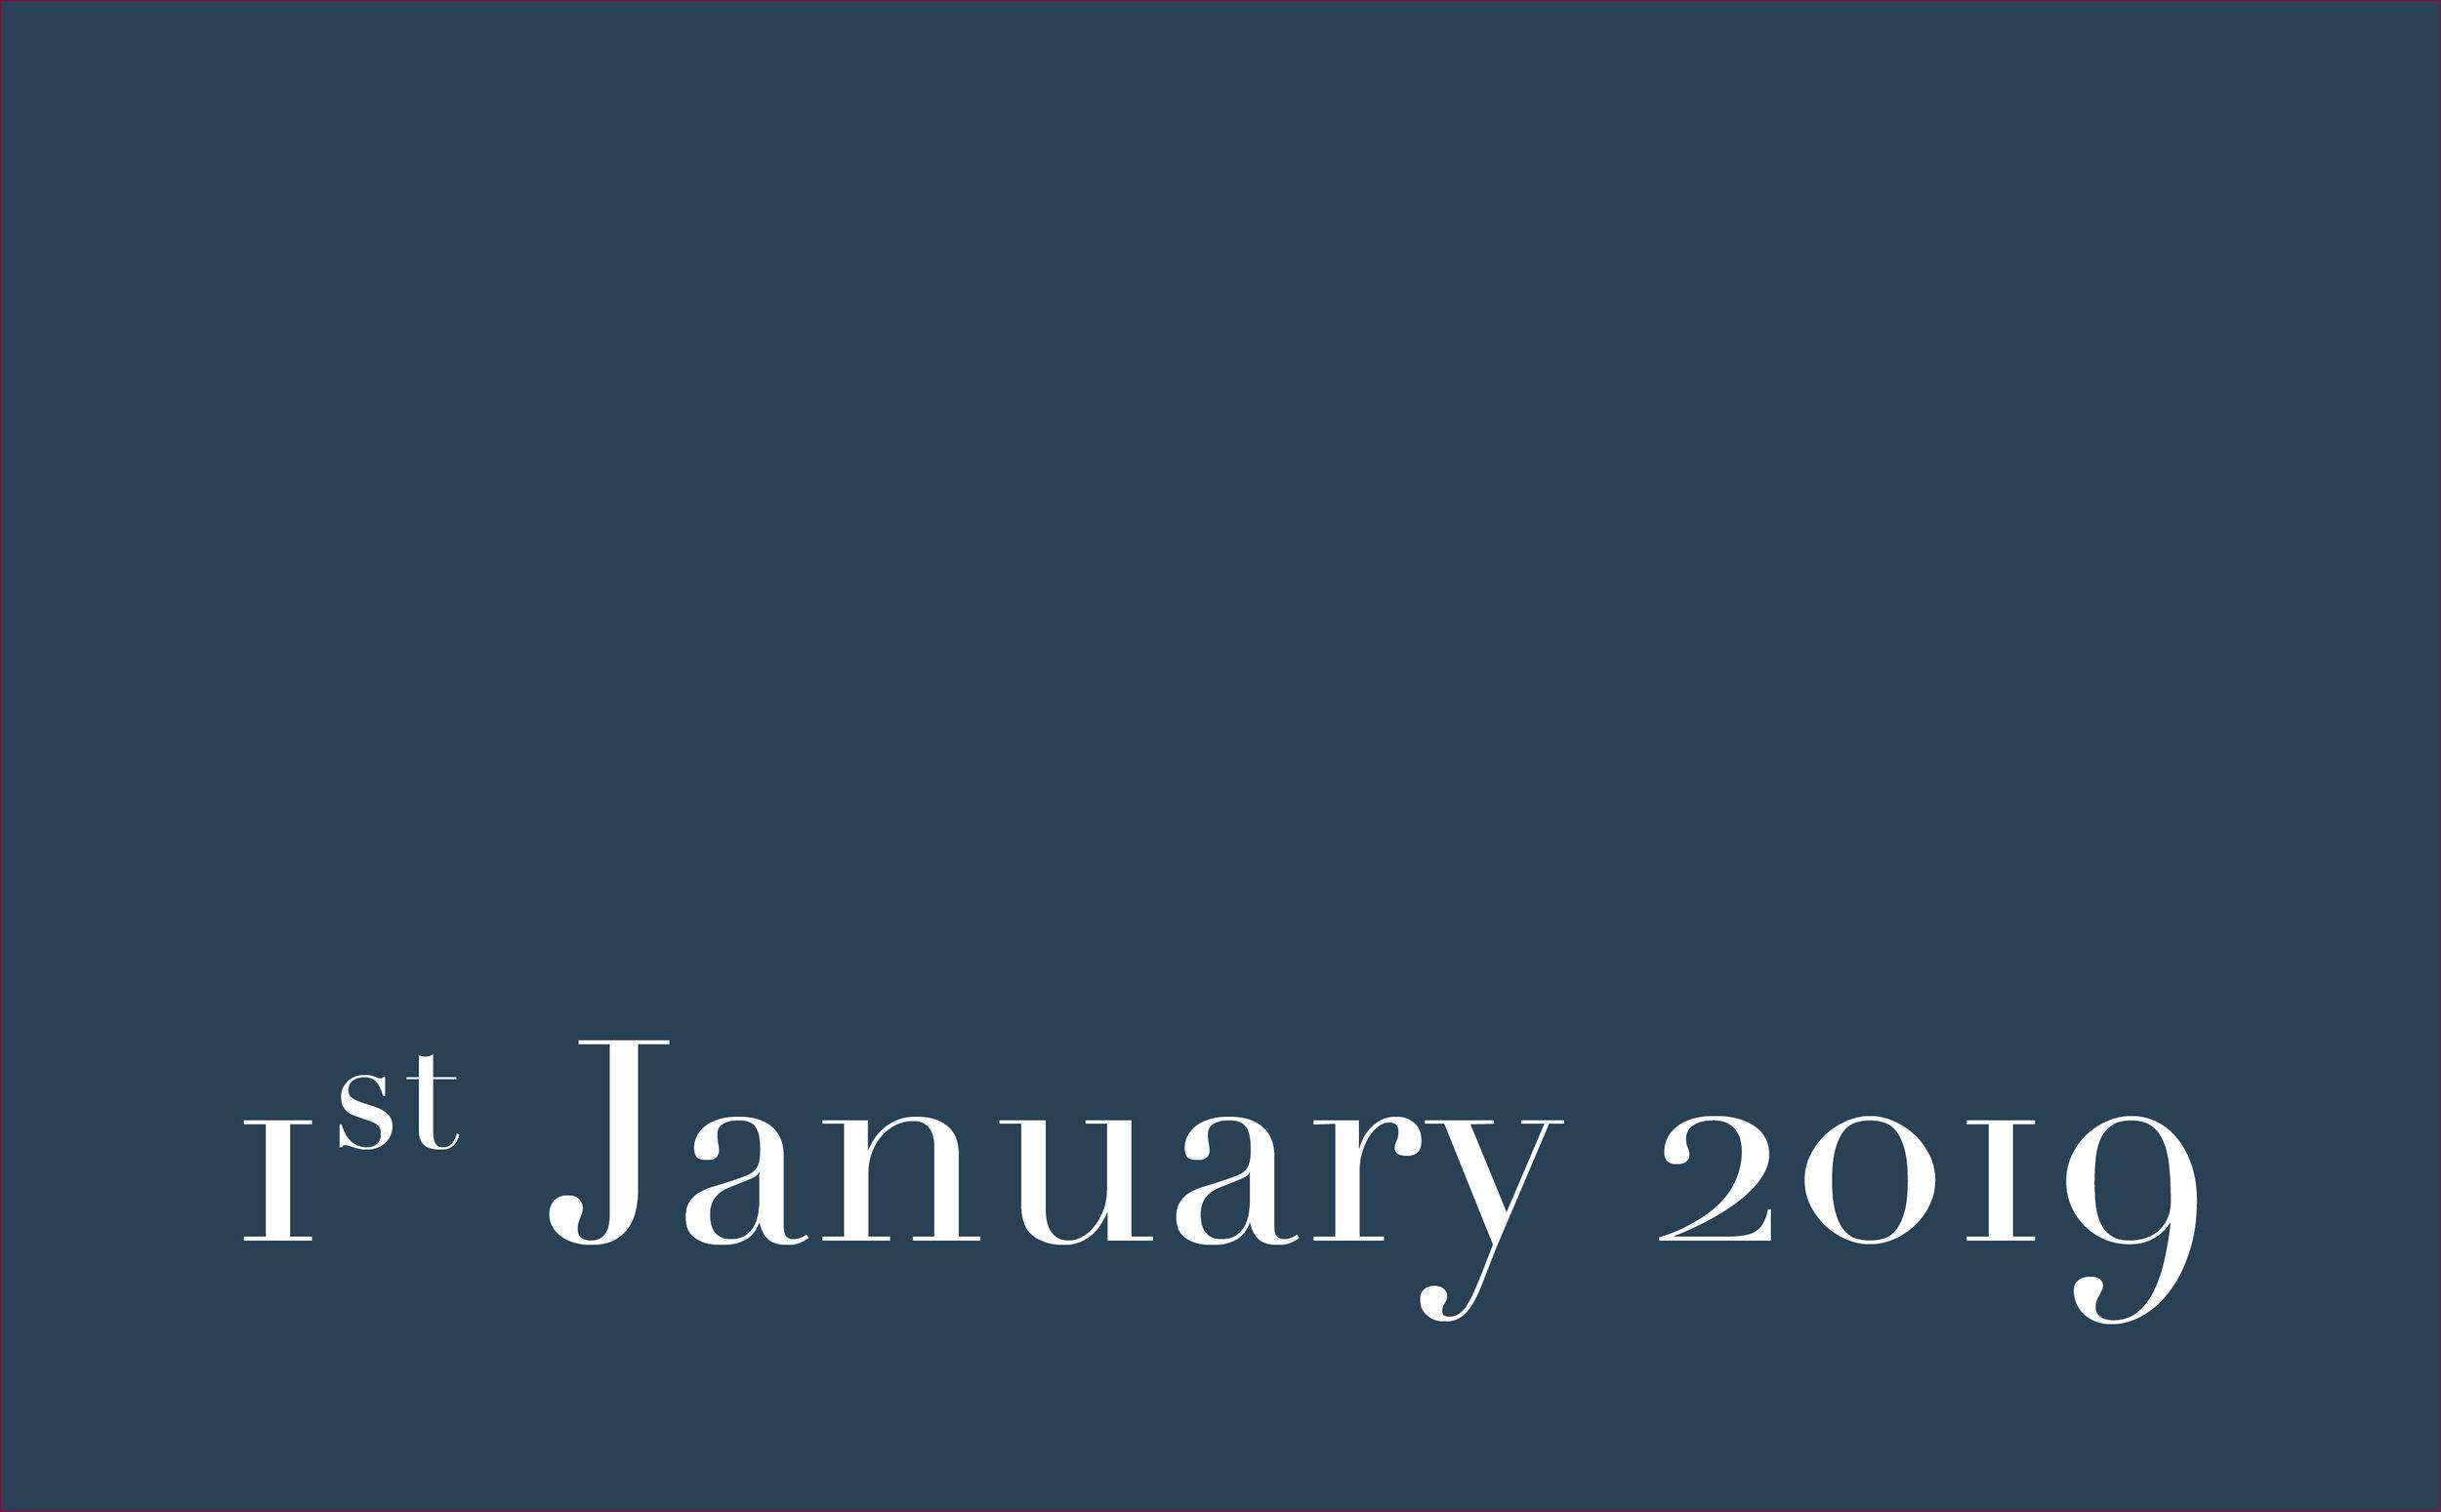 1st January 2019.jpg